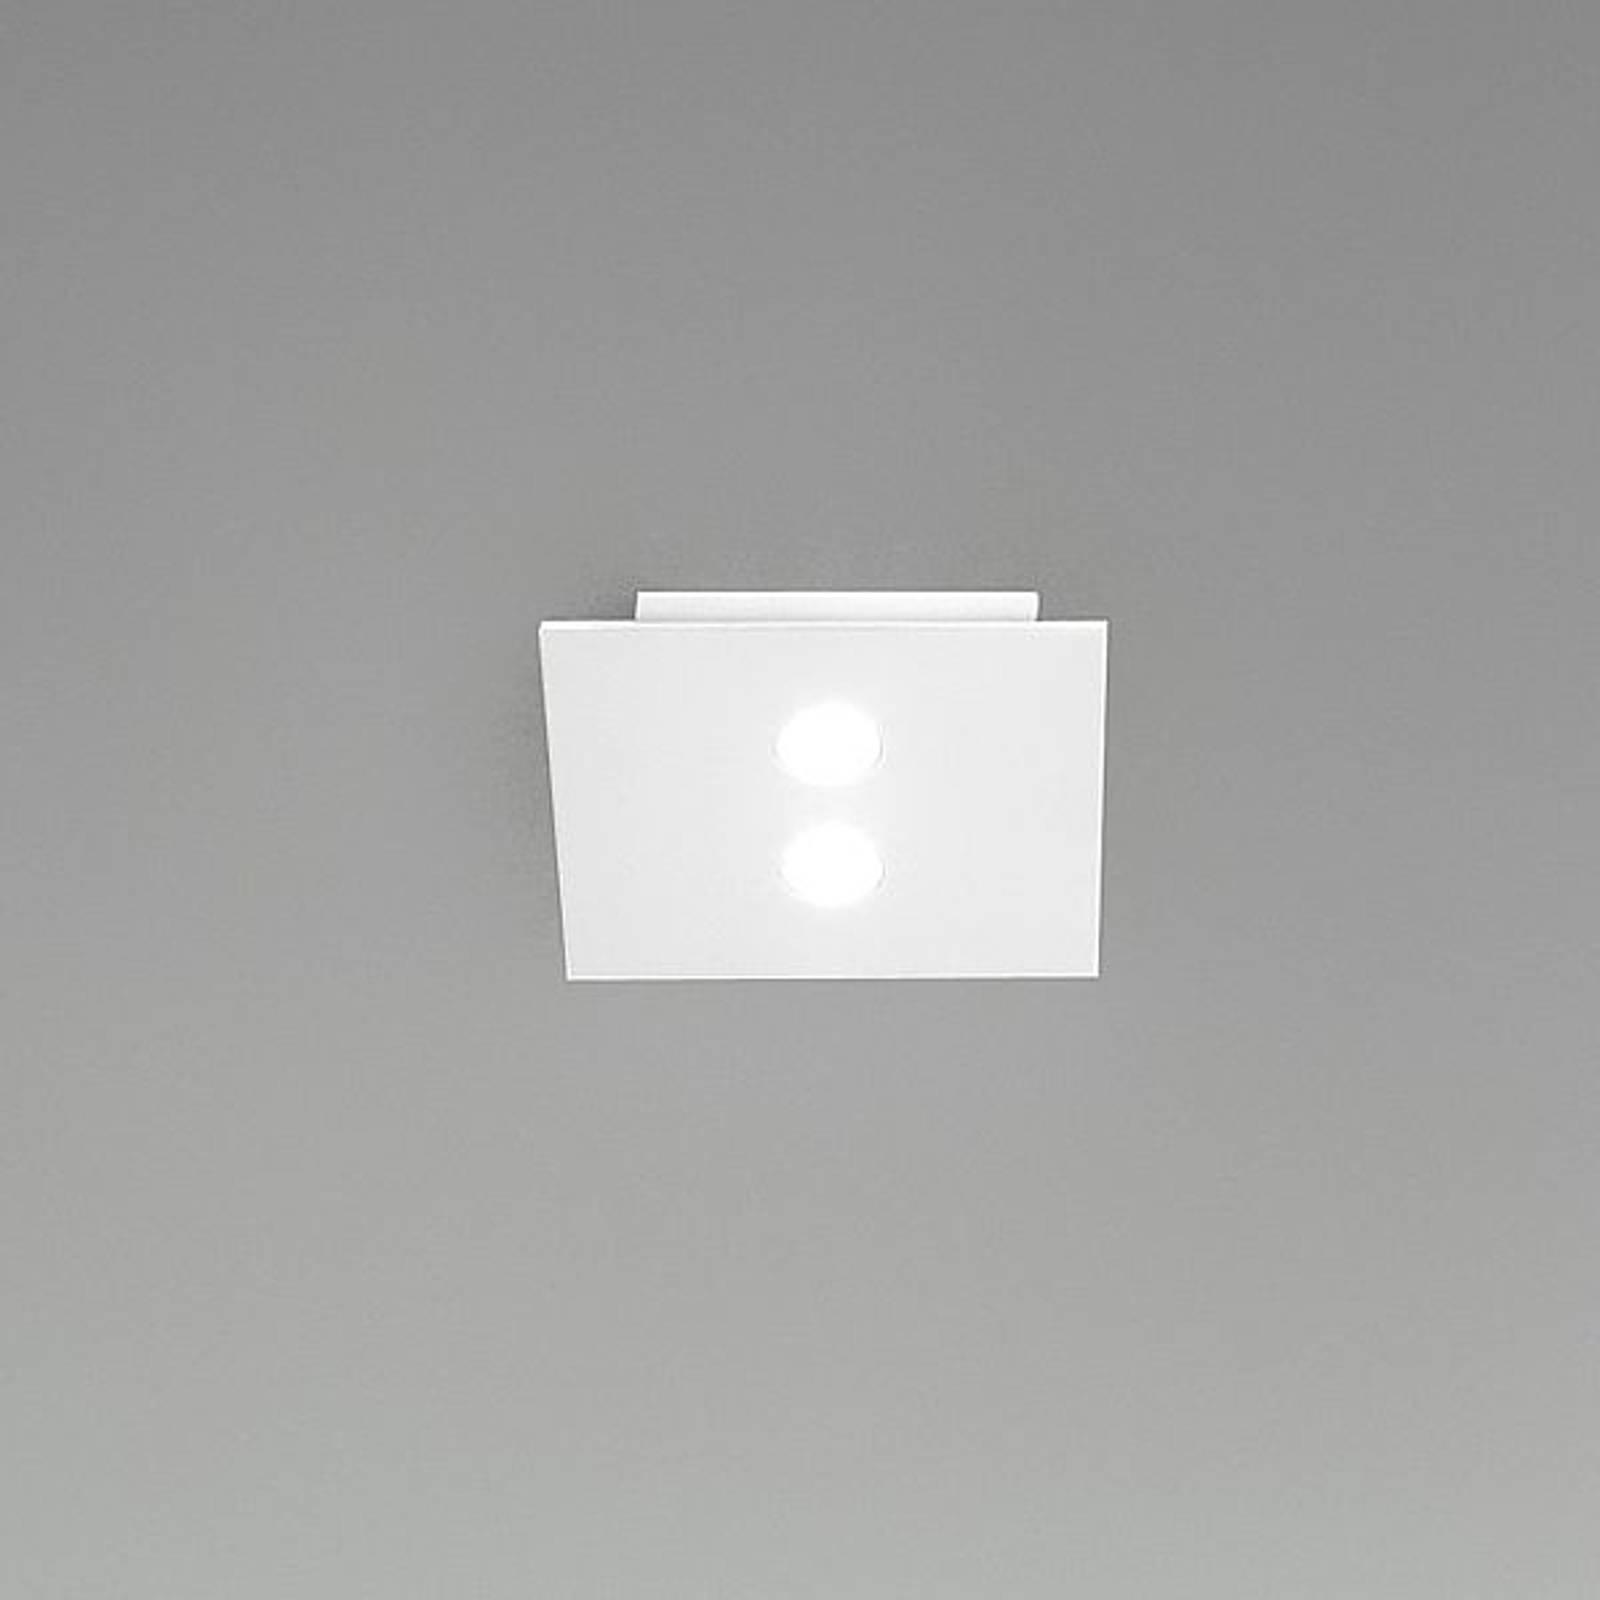 Kleine led-plafondlamp Slim, 2-lichts, wit